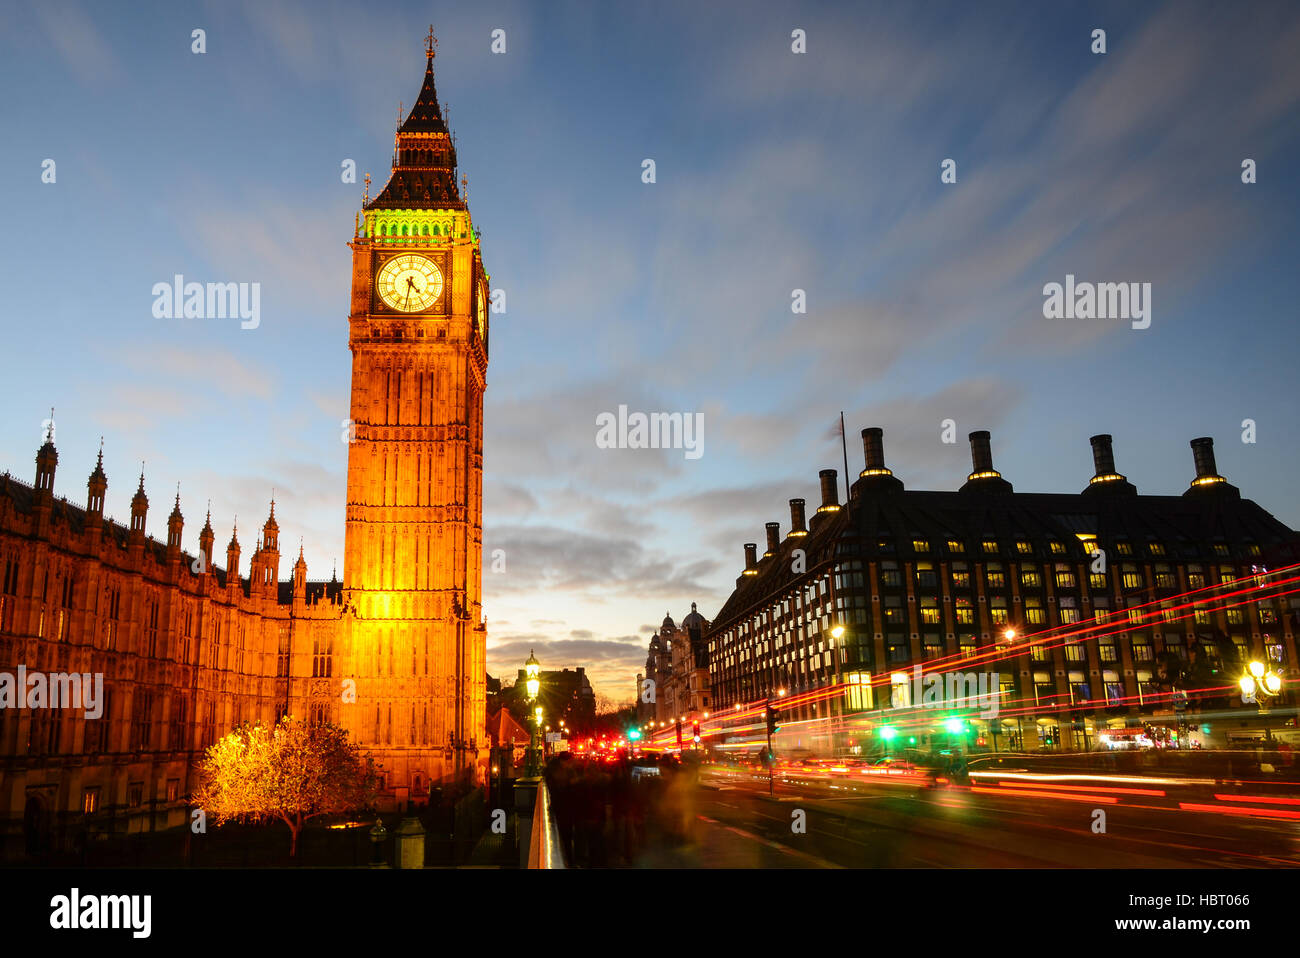 Houses of Parliament, Big Ben, London, England, uk - Stock Image